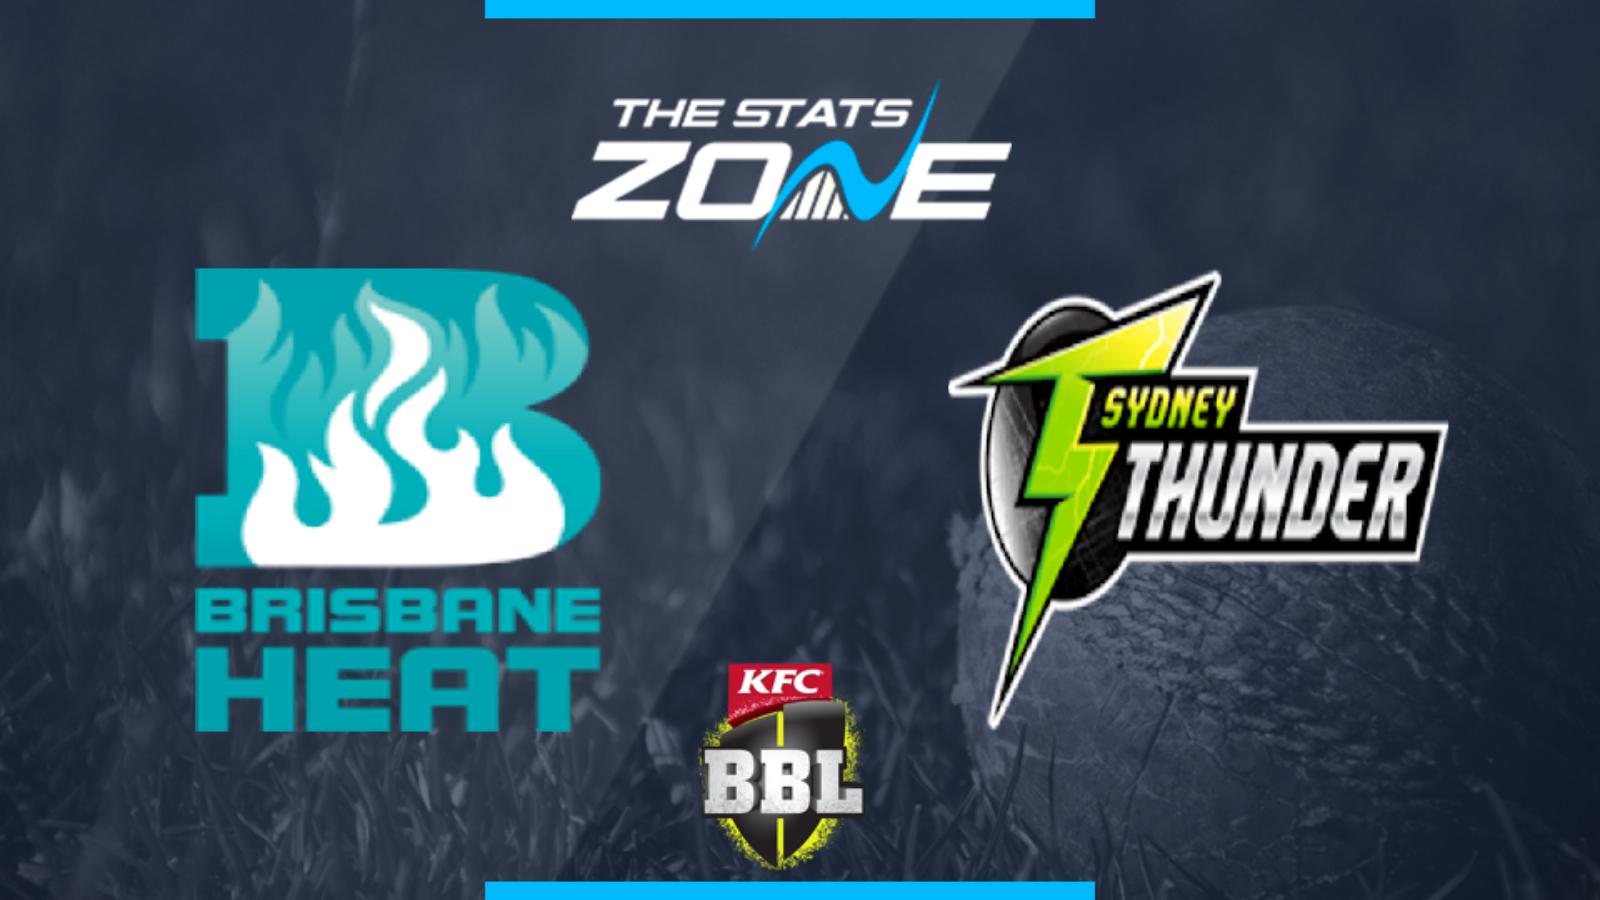 2019 20 Big Bash League Brisbane Heat Vs Sydney Thunder Preview Prediction The Stats Zone